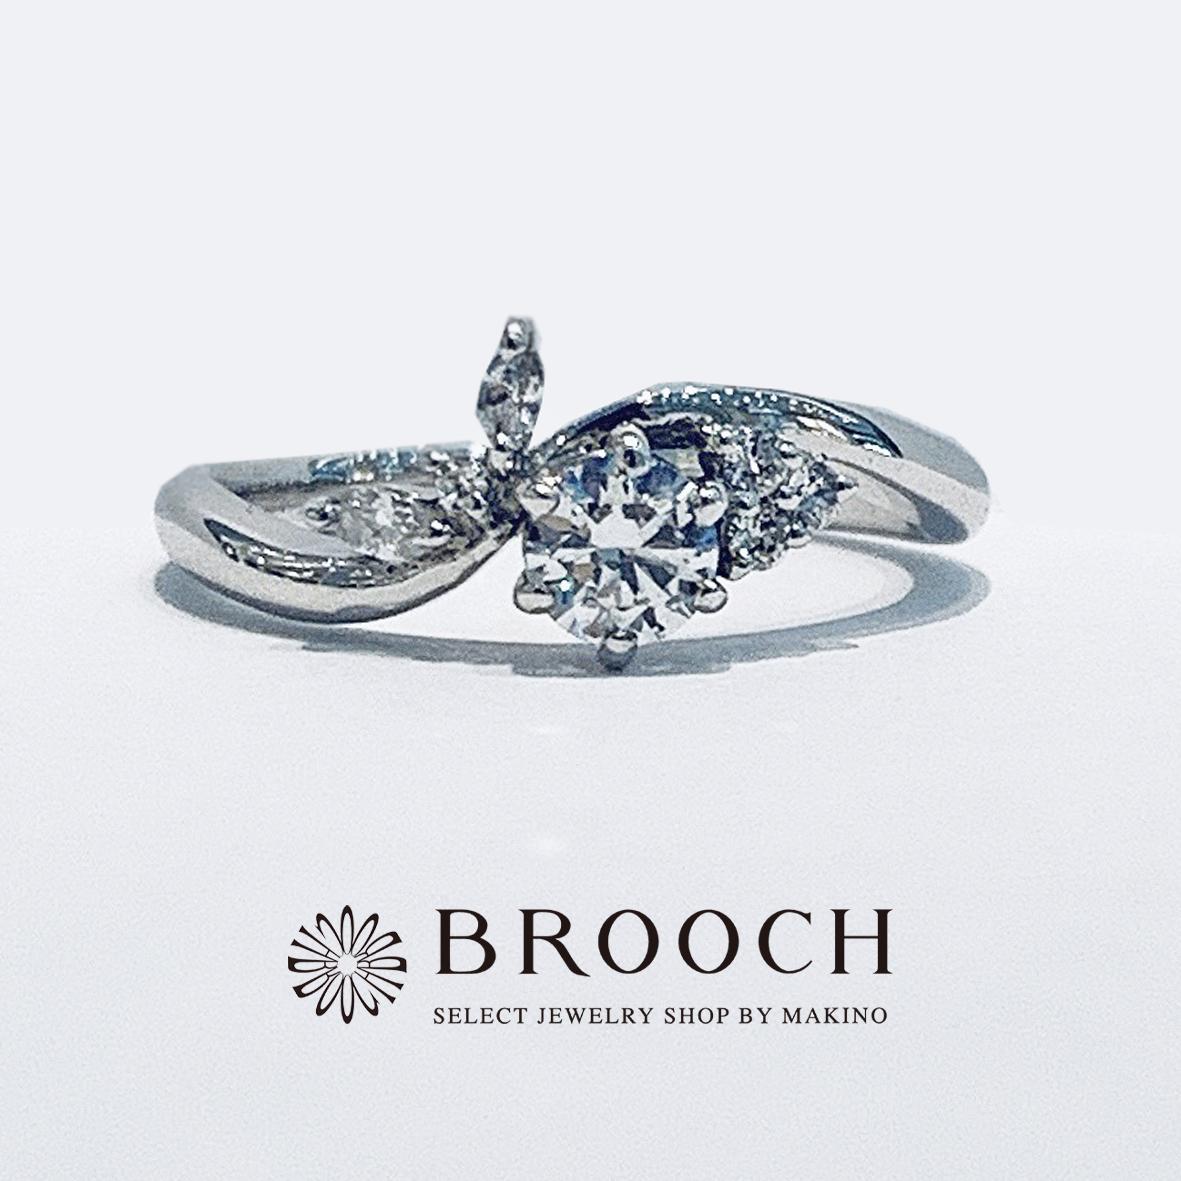 BROOCH 婚約指輪 エンゲージリング ウェーブフラワーデザイン